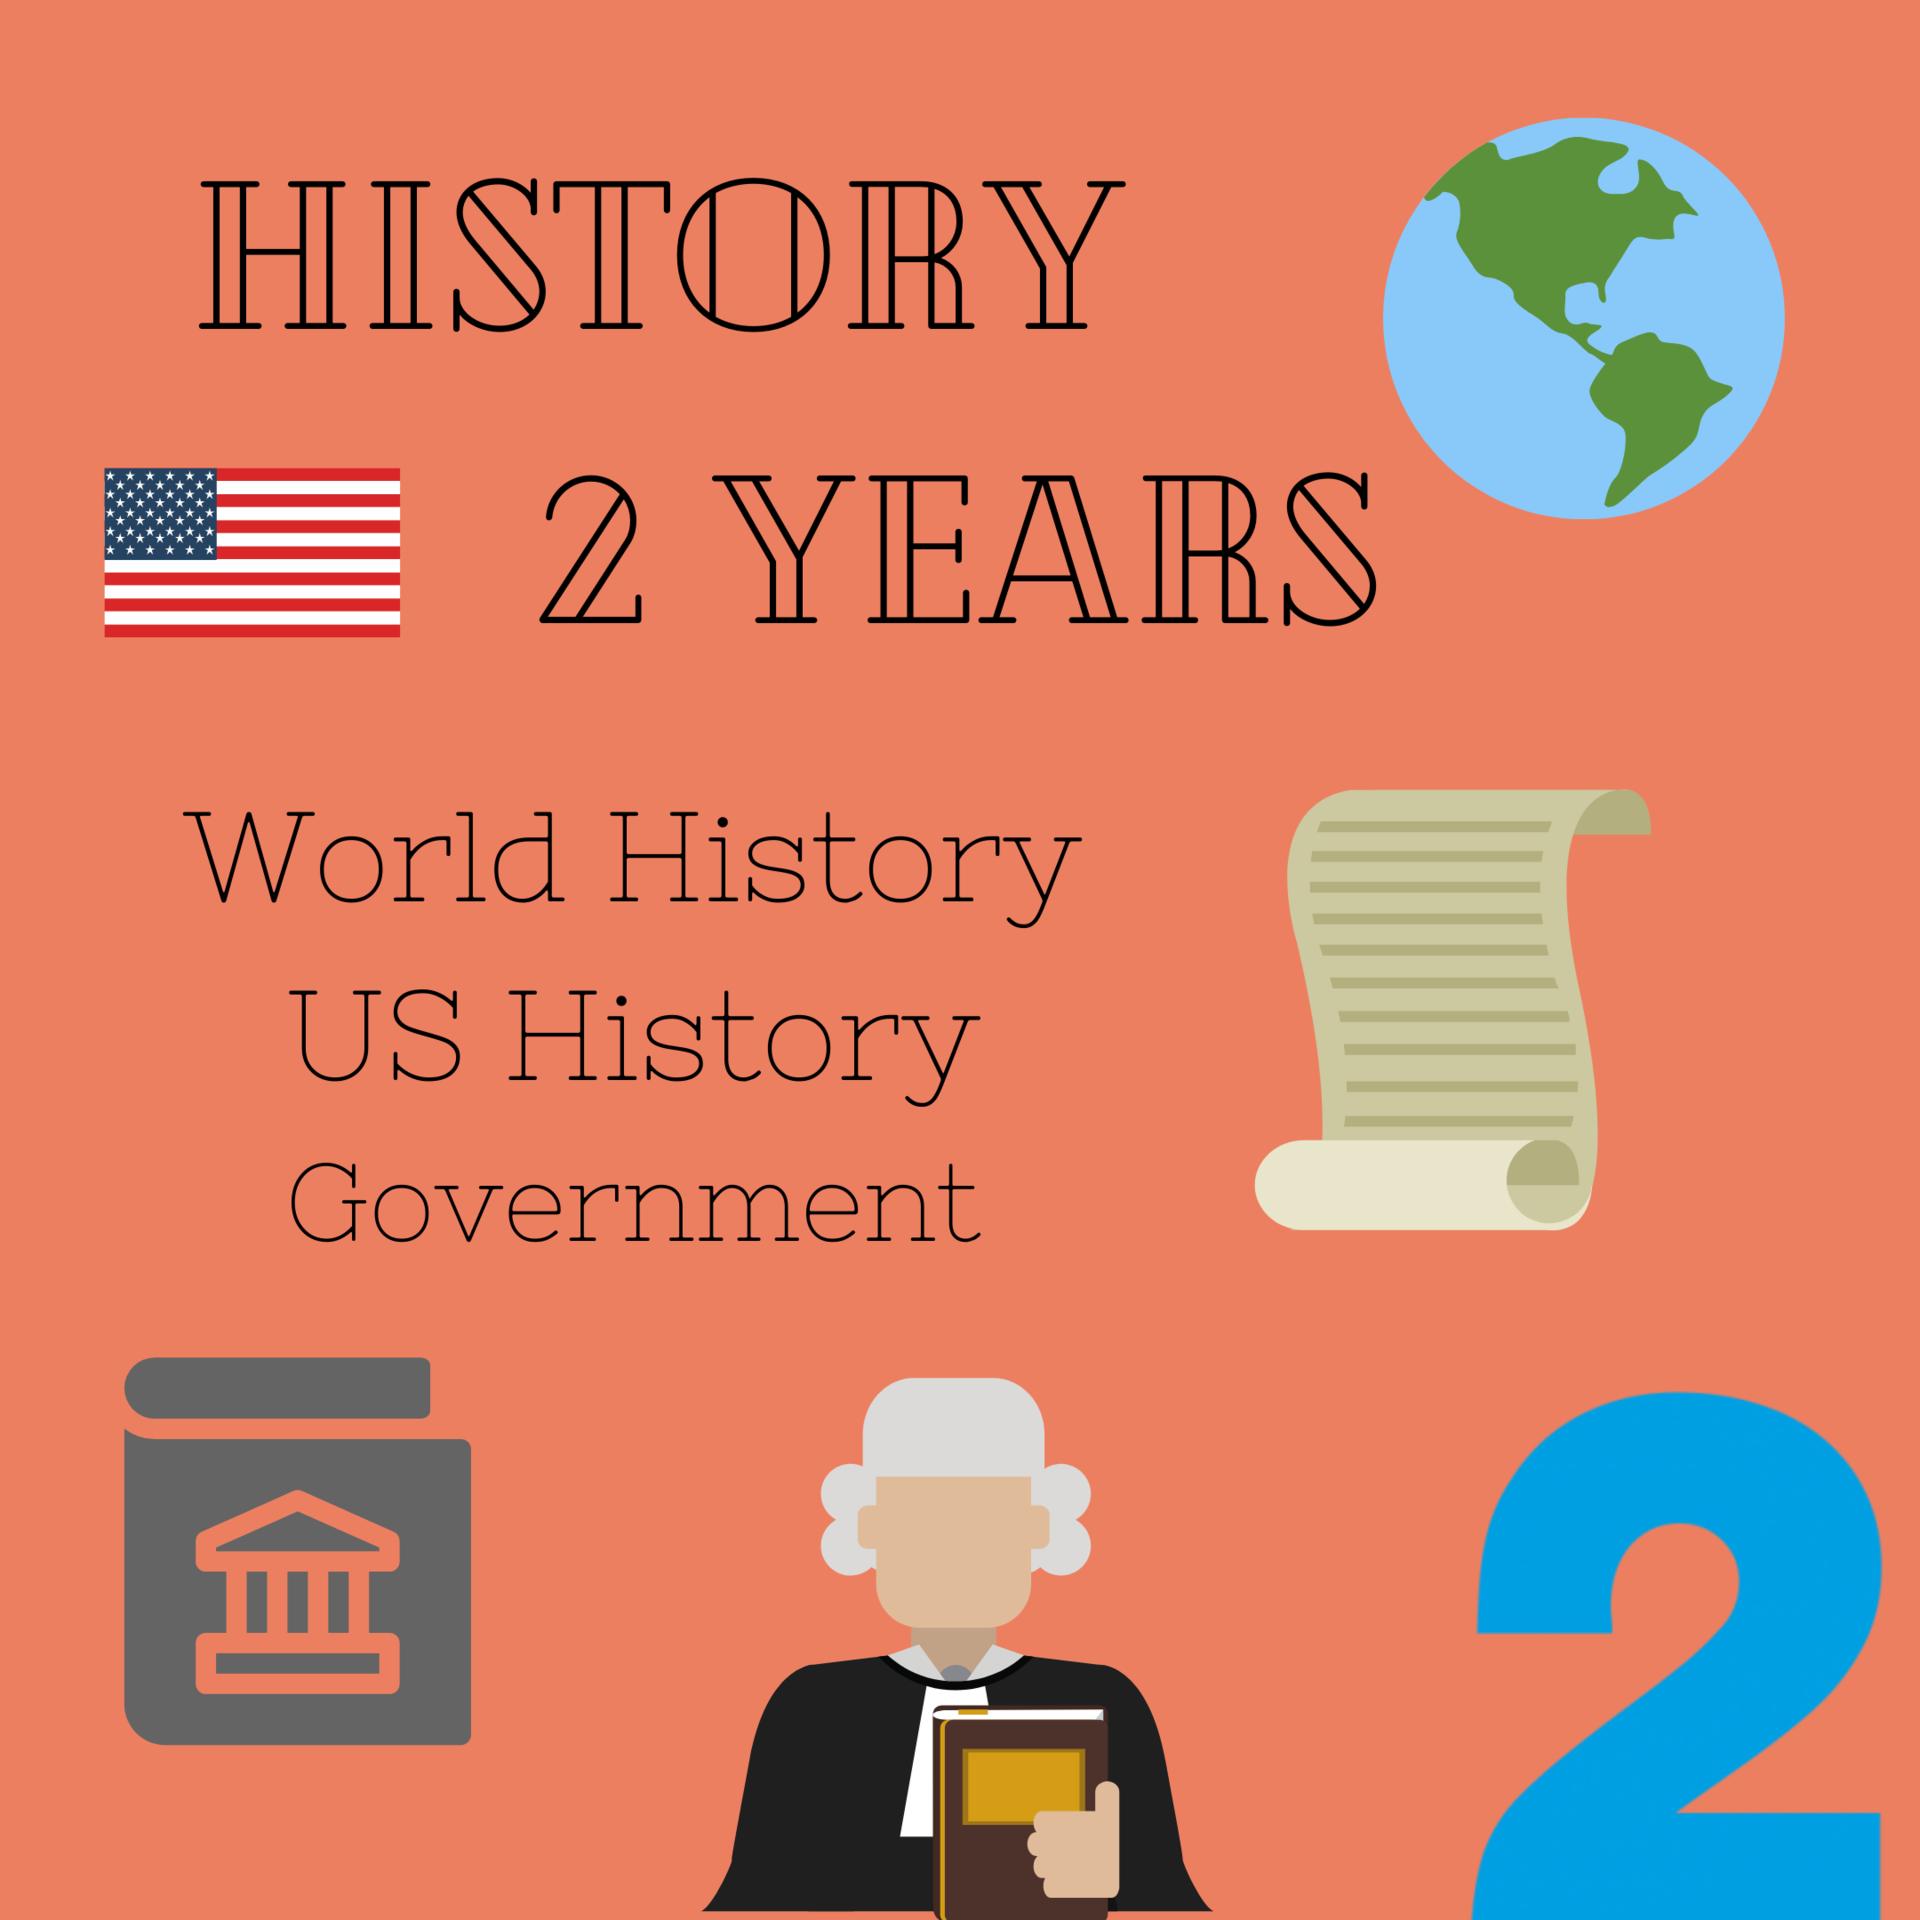 History - 2 Years